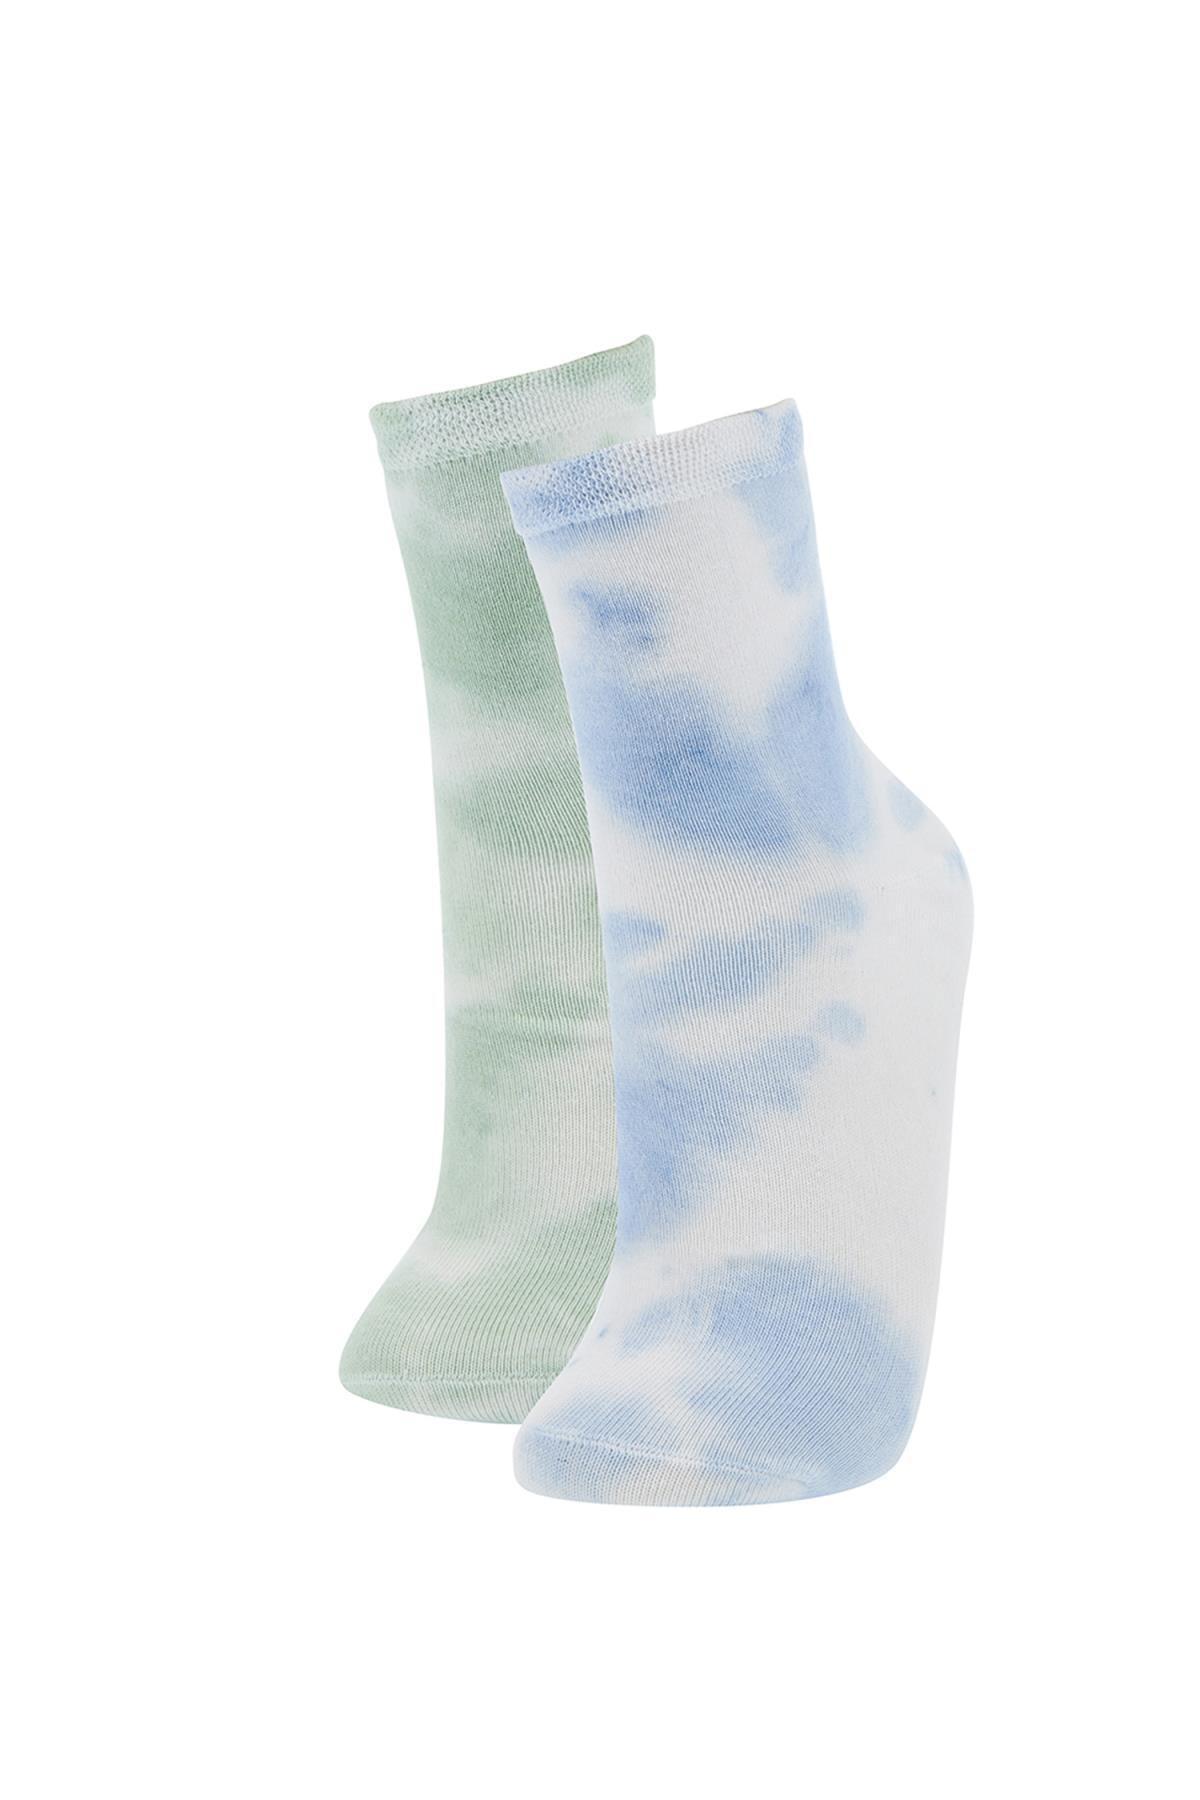 DeFacto Kadın Yeşil Batik Desenli 2'li Soket Çorap V0565AZ21SP